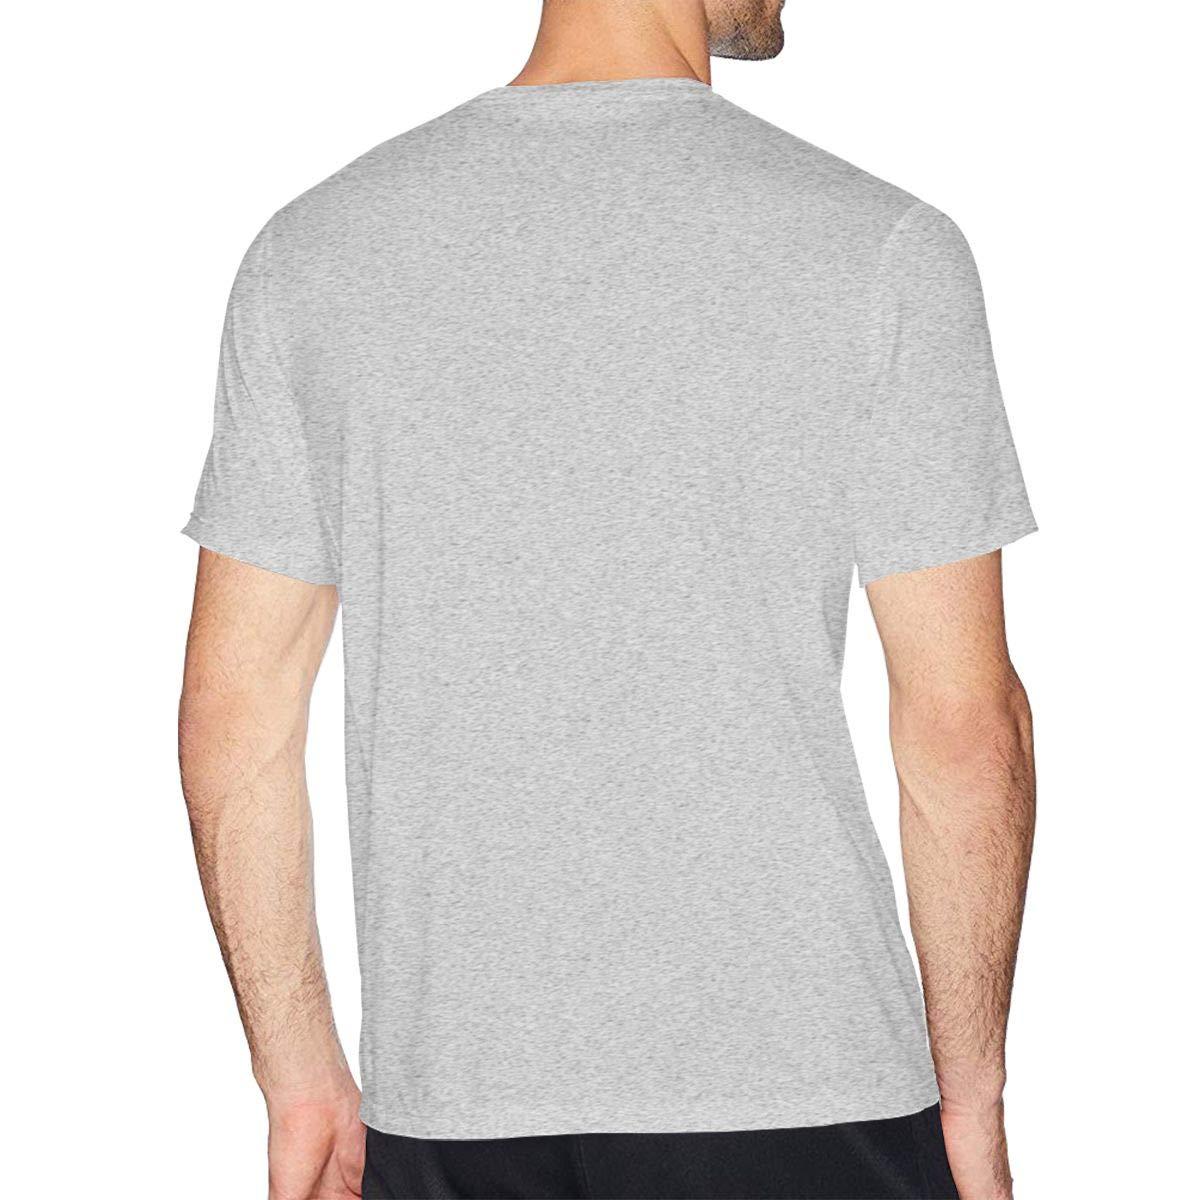 Wales Welsh Dragon Yard Flag Mens Shirt Short Sleeve T-Shirt Casual Shirt for Men Teenagers